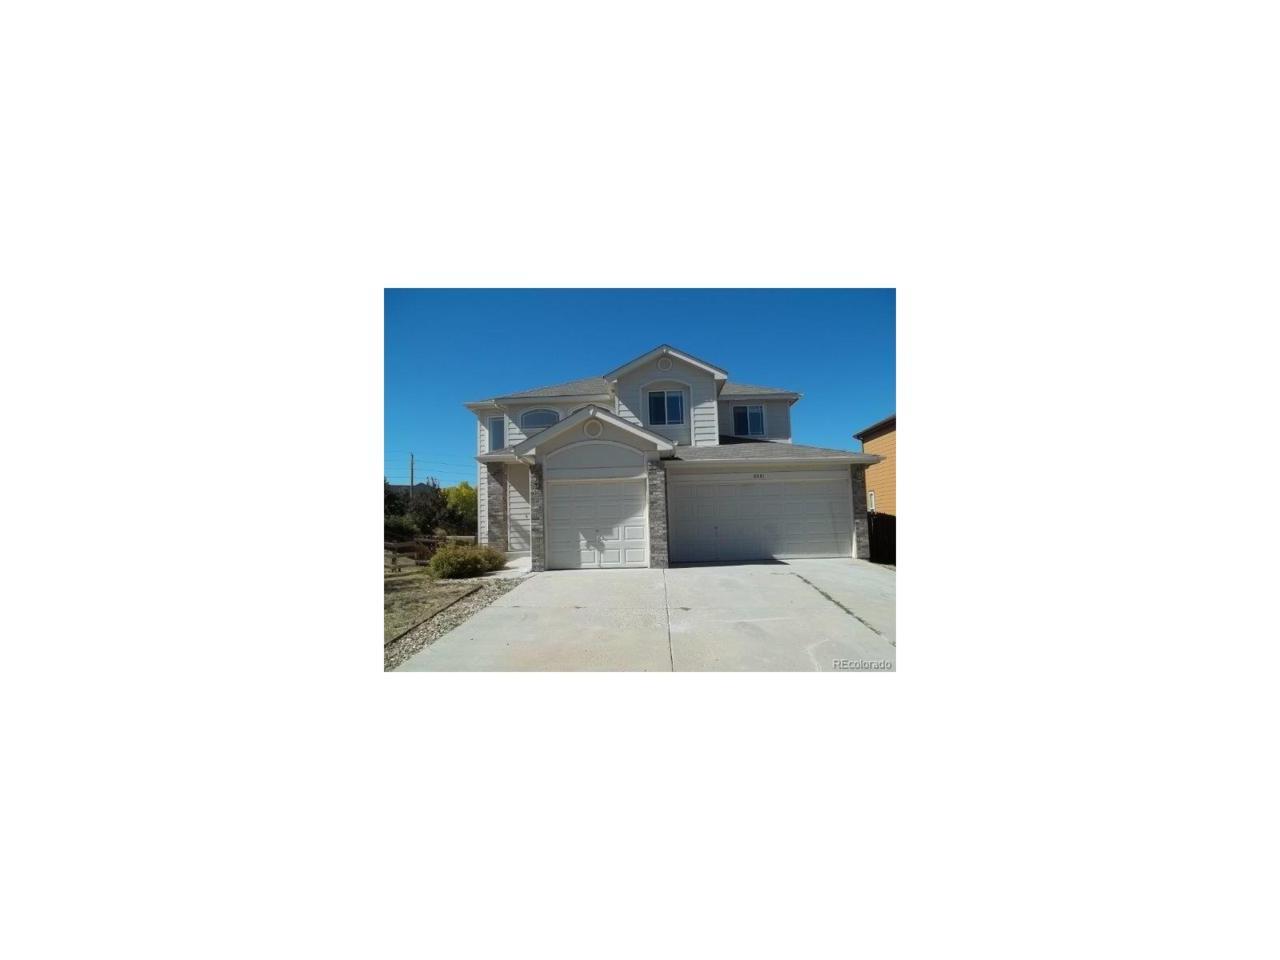 6591 S Otis Way, Littleton, CO 80123 (#5921816) :: Thrive Real Estate Group